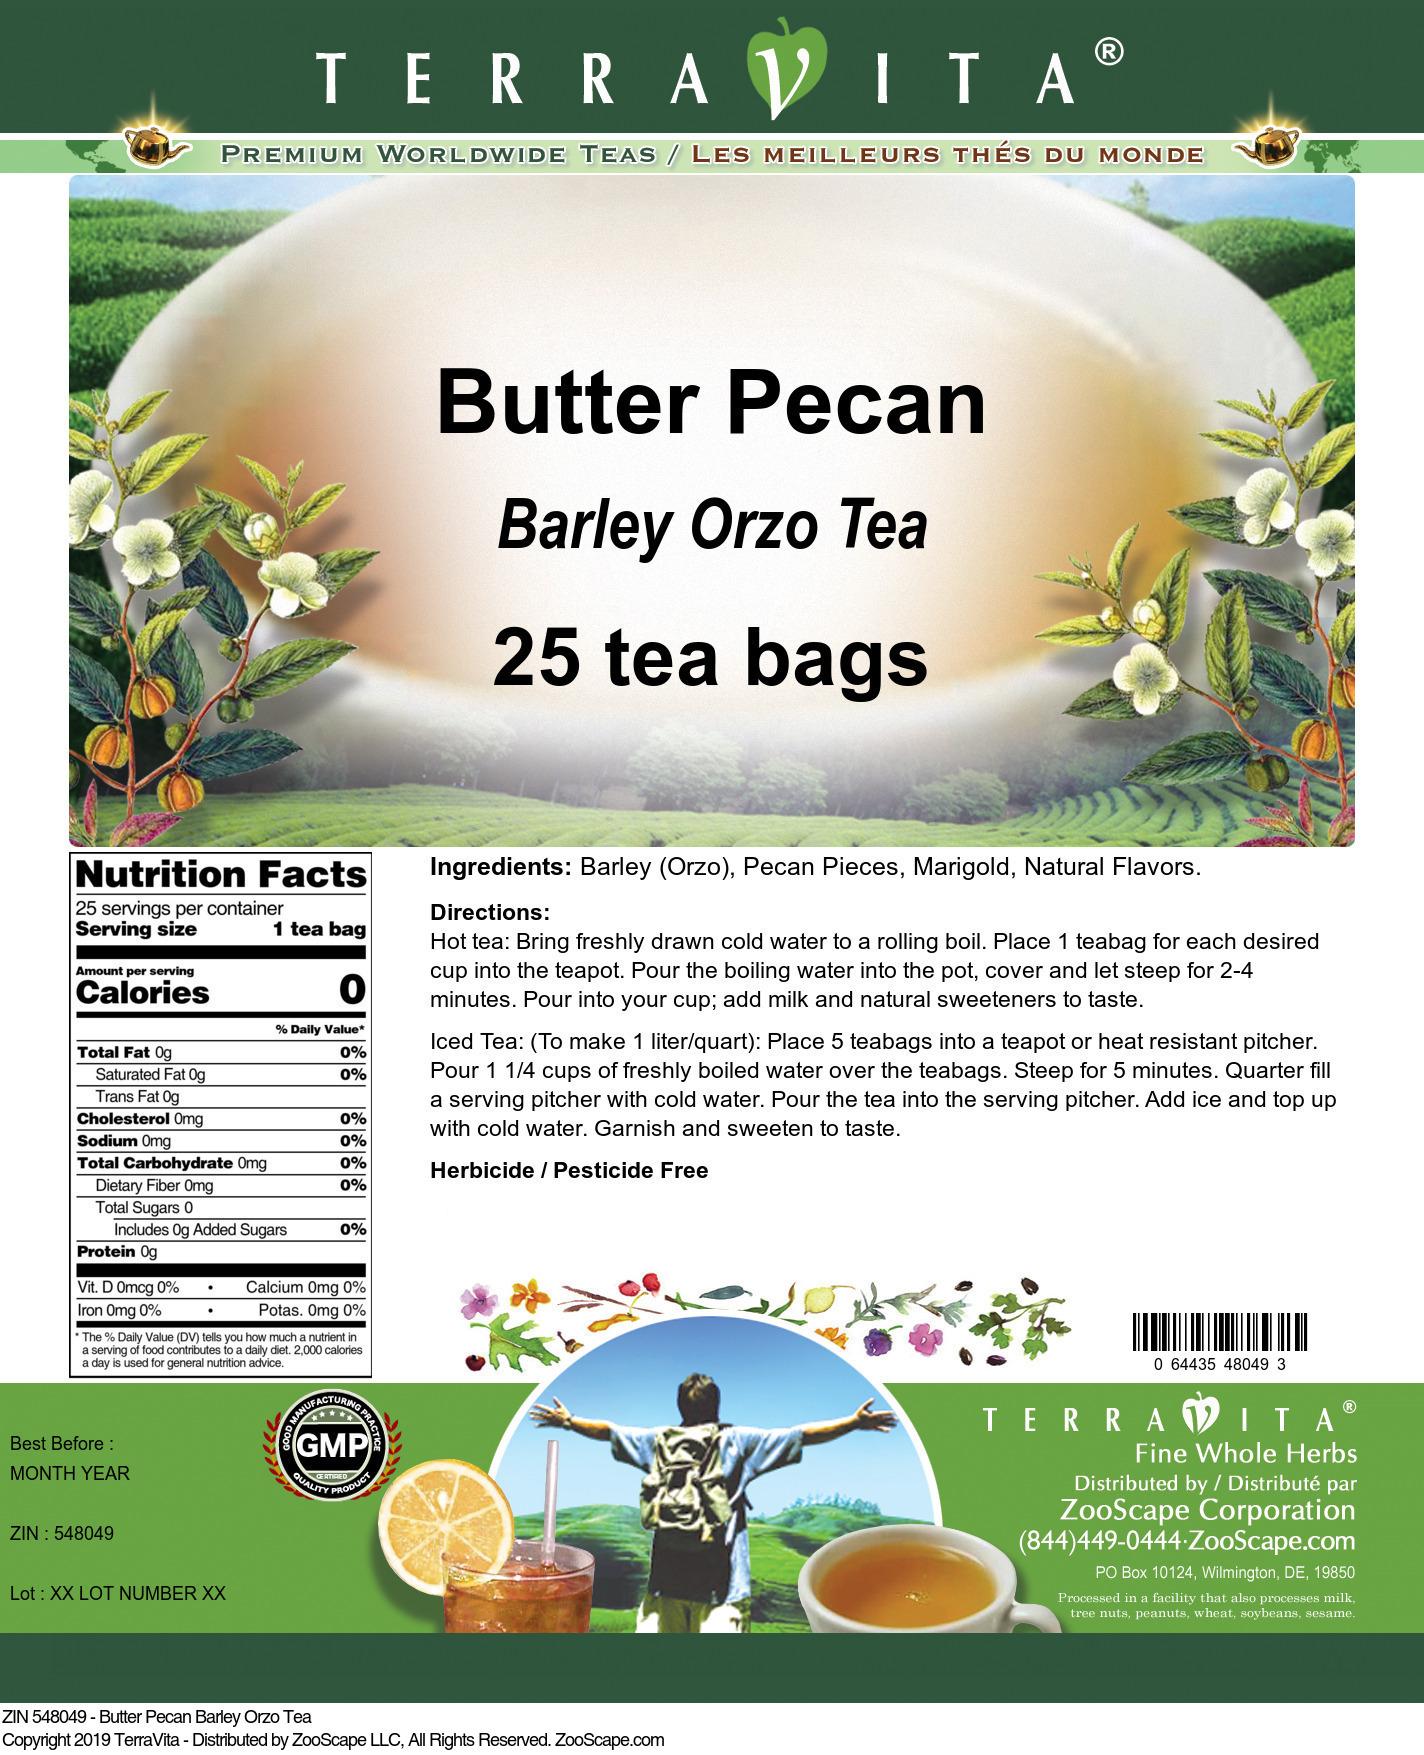 Butter Pecan Barley Orzo